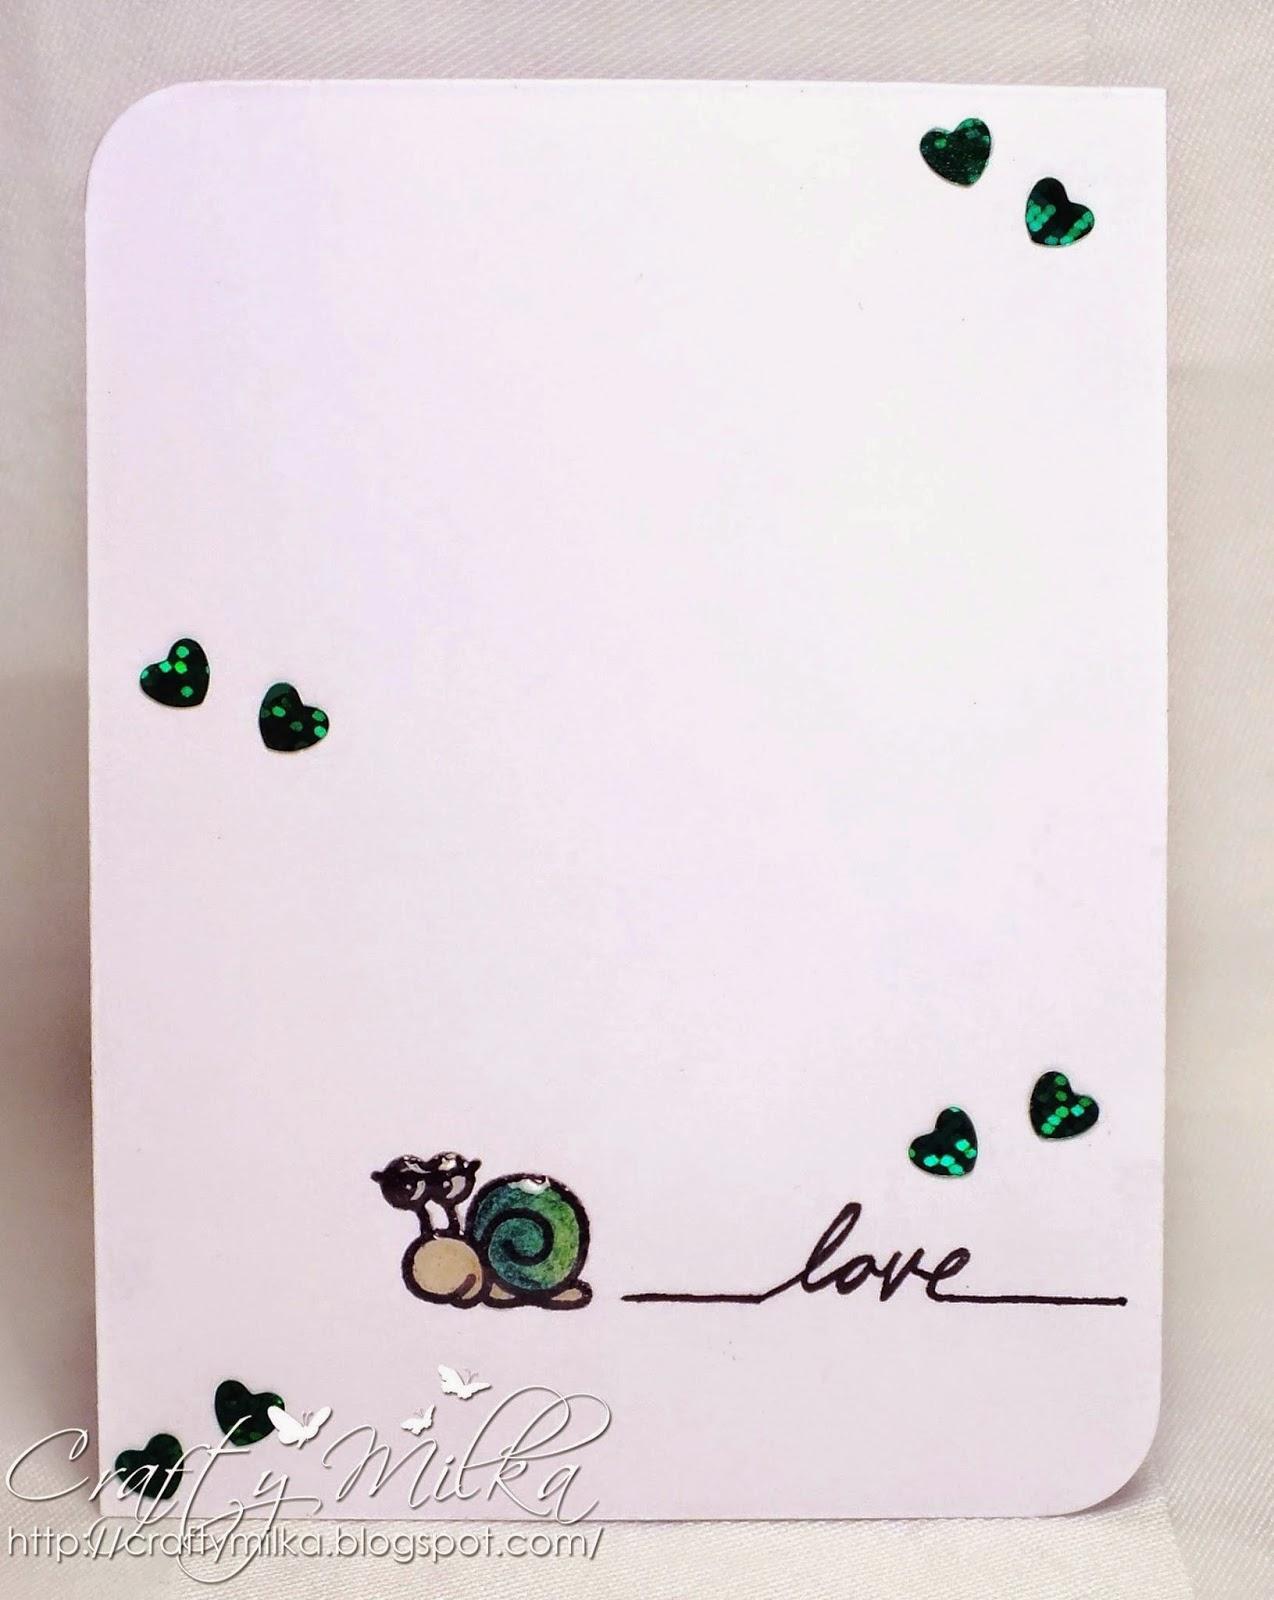 http://craftymilka.blogspot.com/2015/03/love-mini-card.html